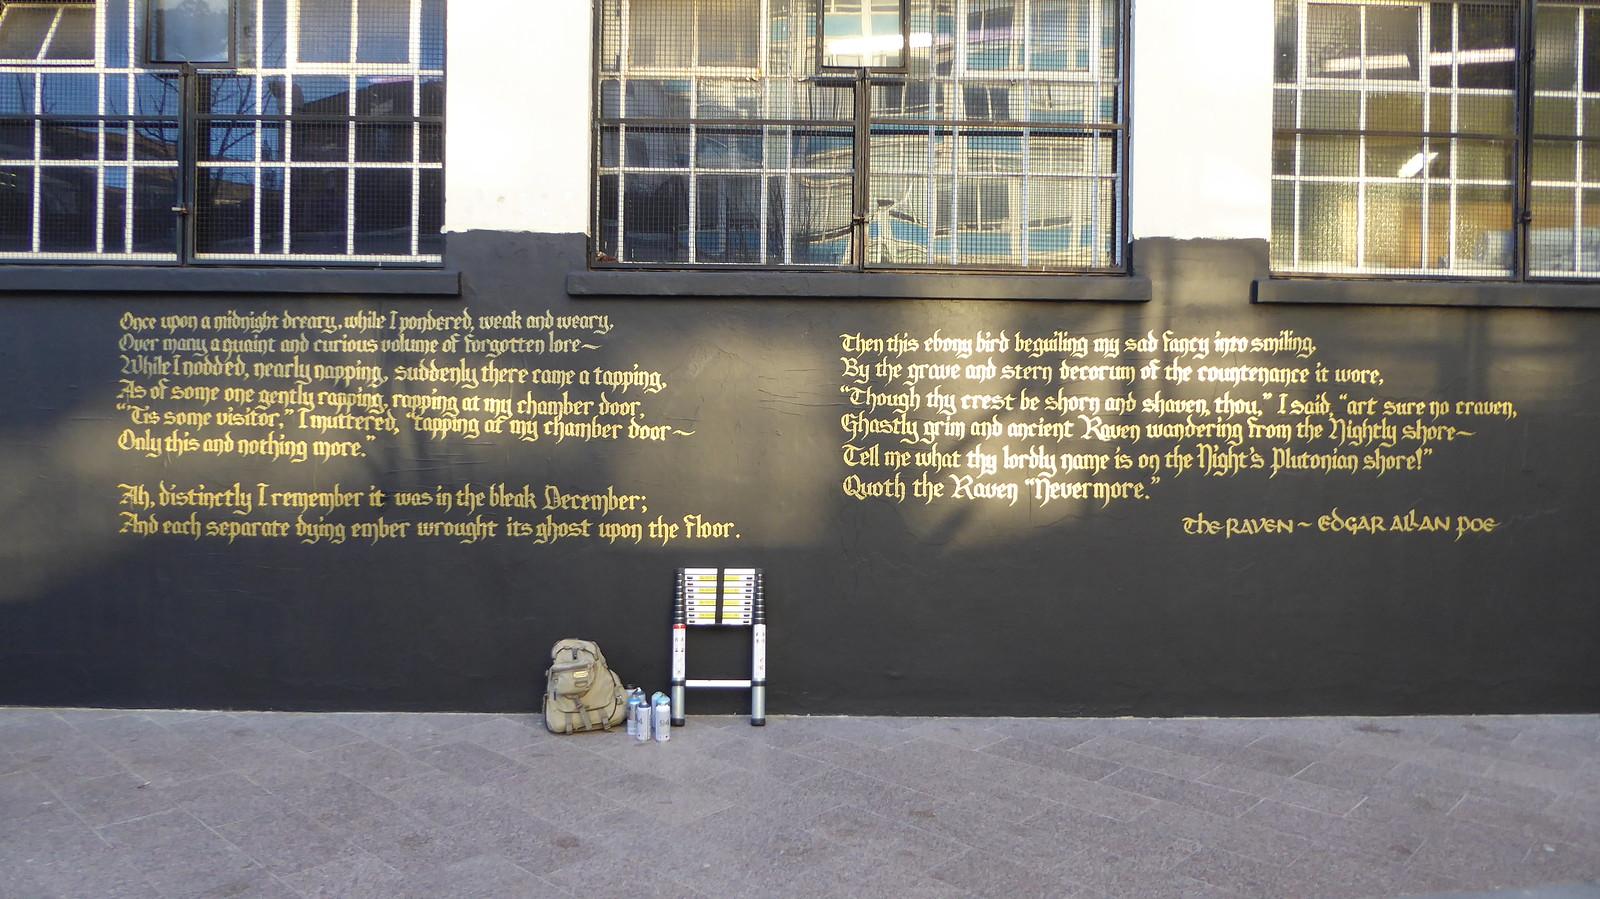 Artful Dodger Graffiti Brixton The Raven By Edgar Allan P Flickr